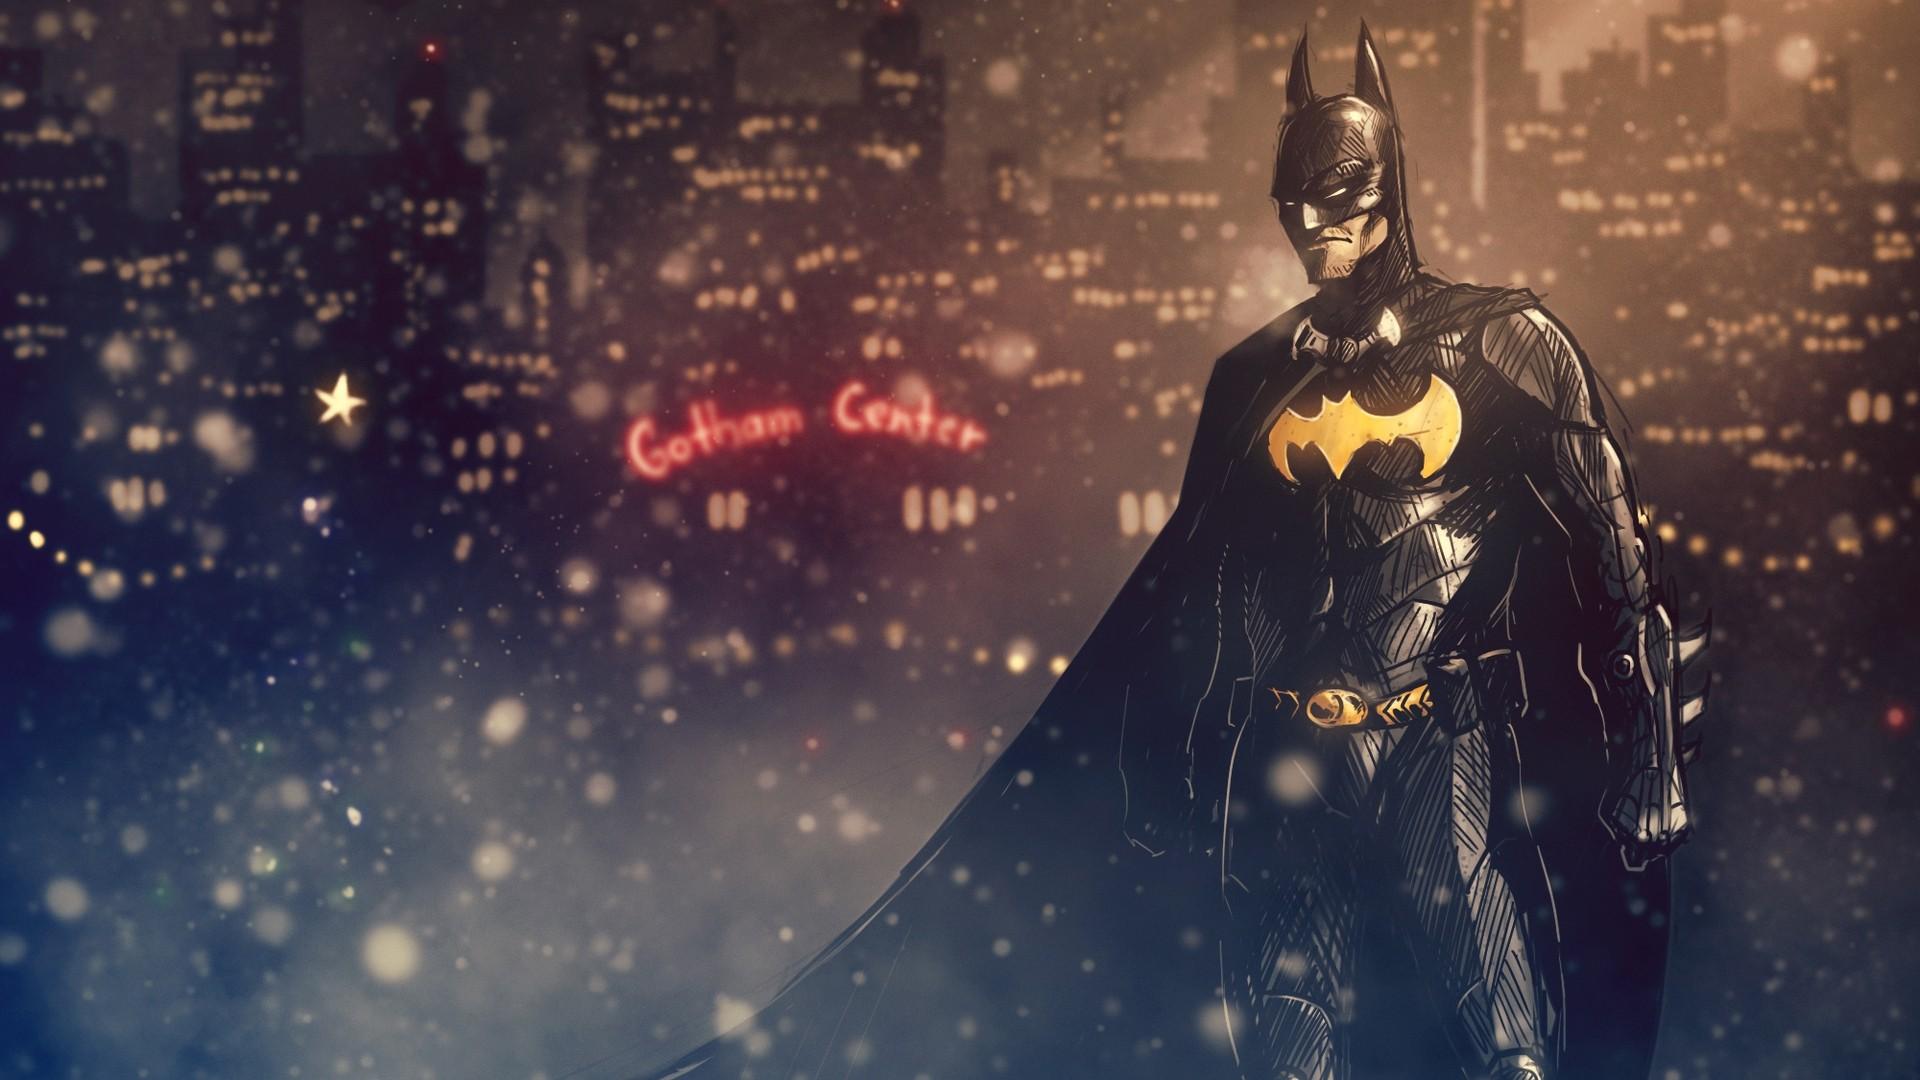 Batman Art wallpaper for desktop